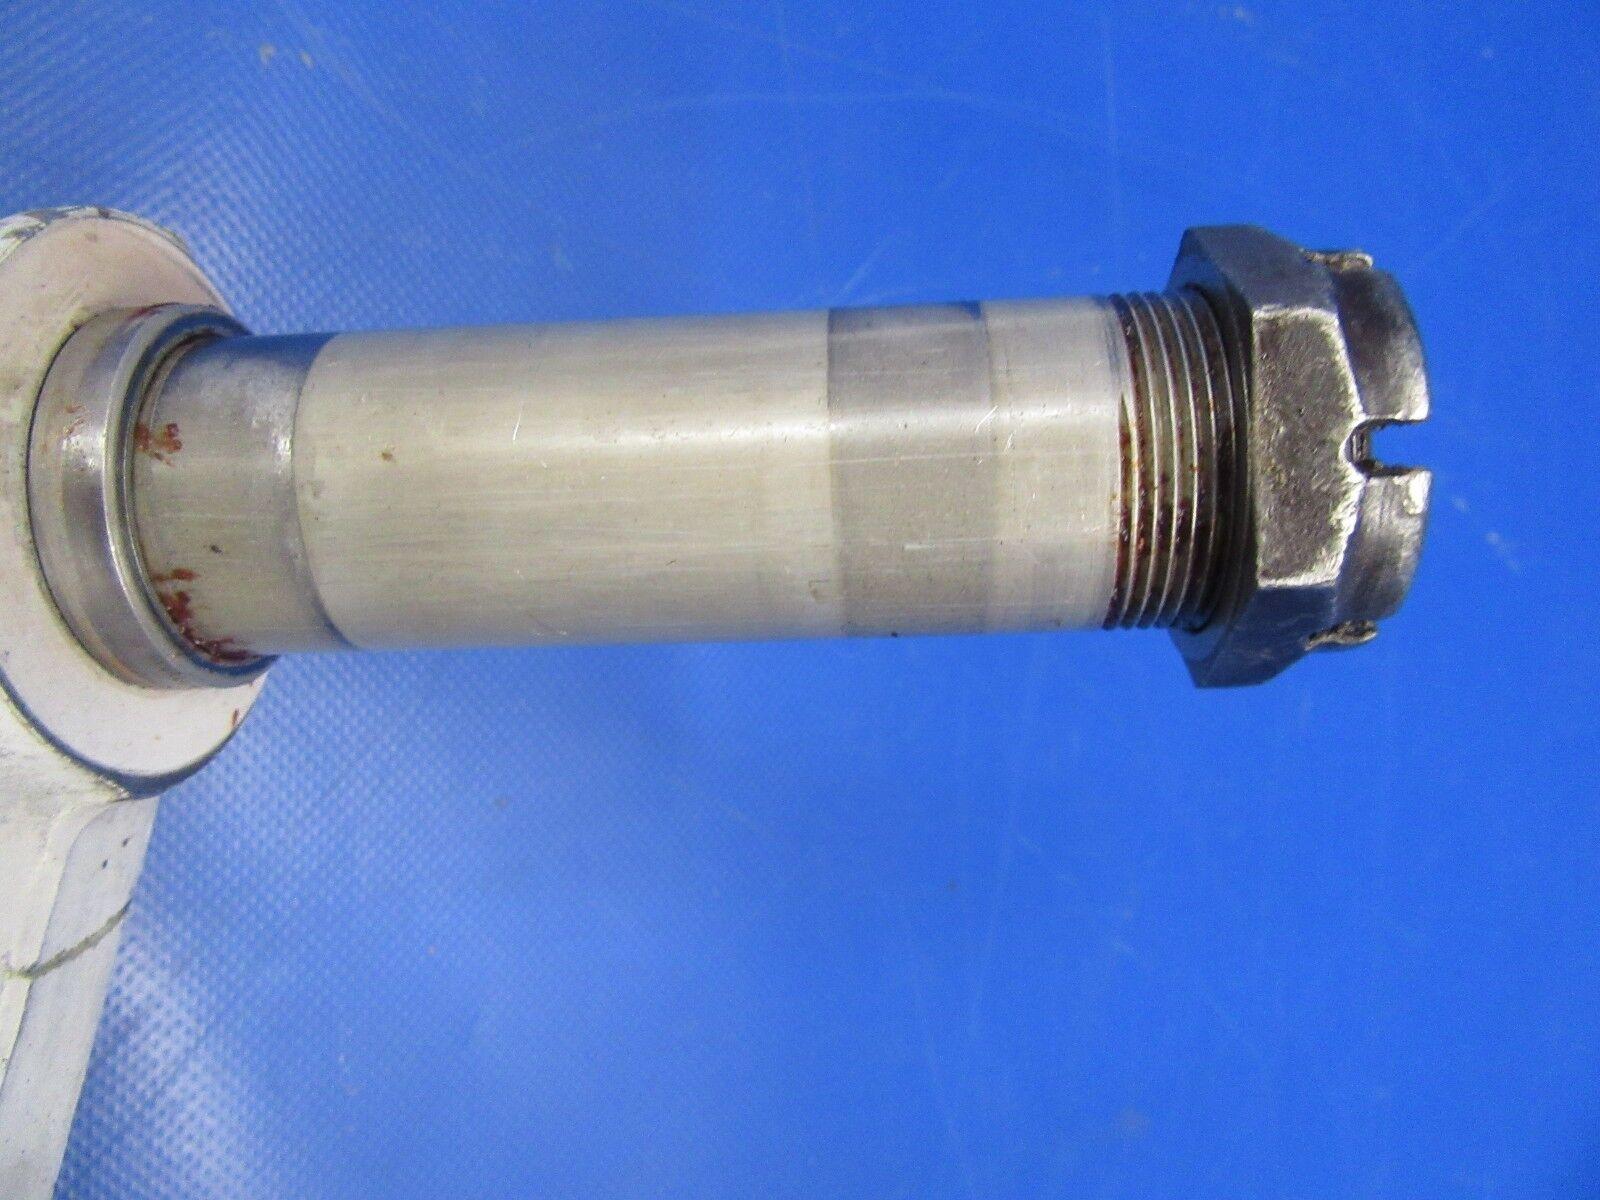 Beech Baron 95-B55 Nose Gear P/N 35-825196-696 (1018-29)